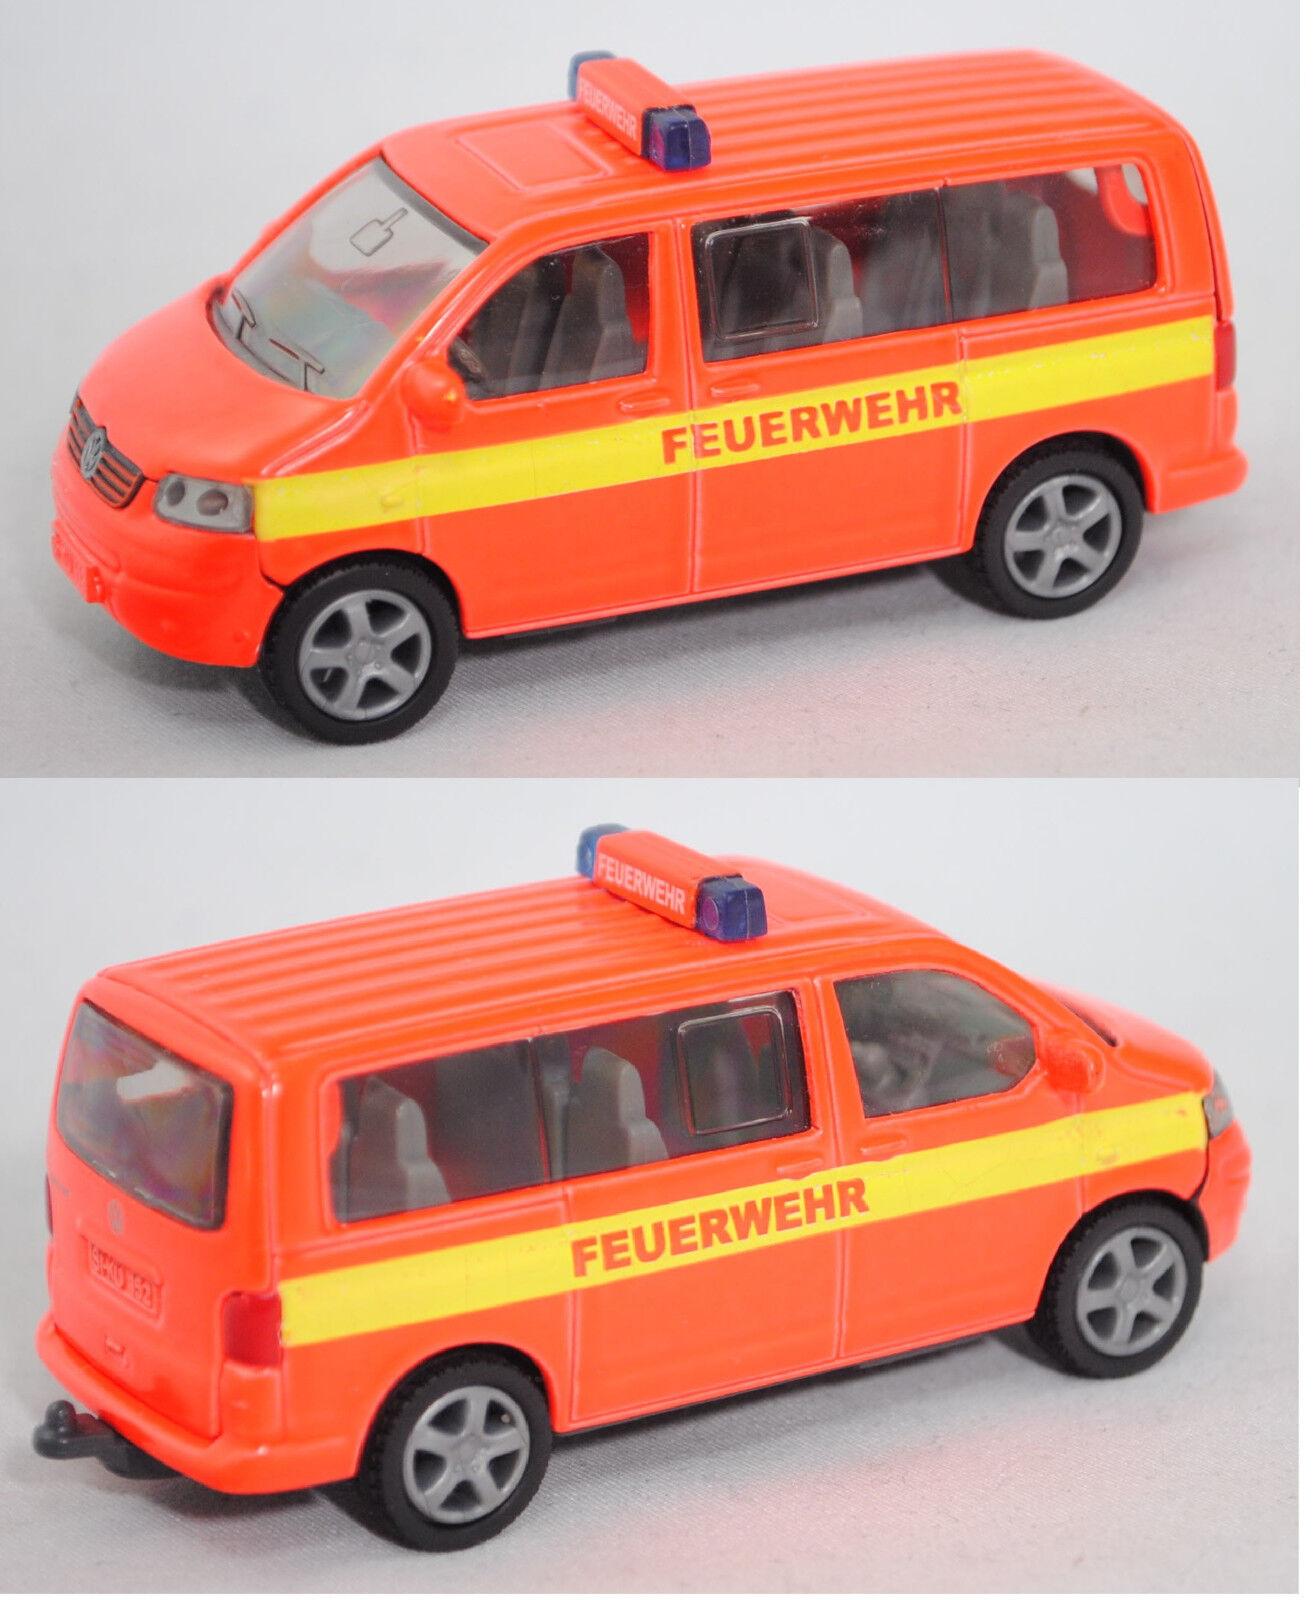 Siku Super 1070 VW t5 Multivan vigili del fuoco-einsatzleitwagen pubblicitari sikumuseum modello